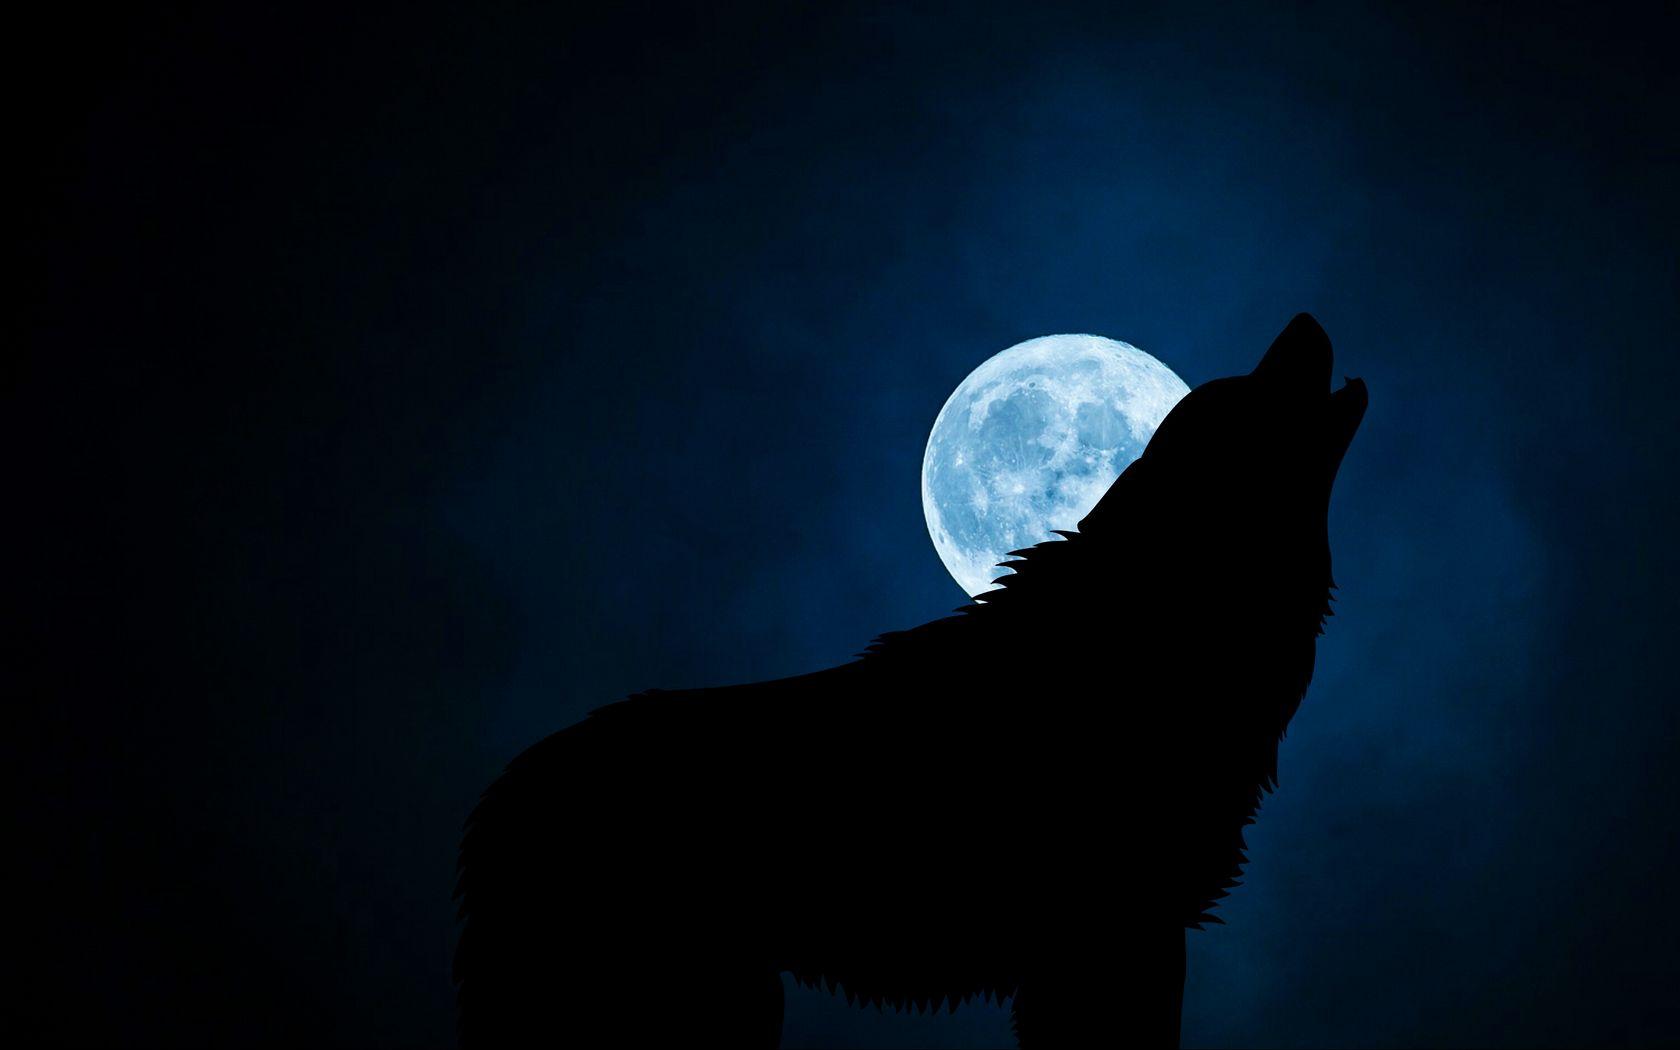 1680x1050 Wallpaper wolf, silhouette, moon, night